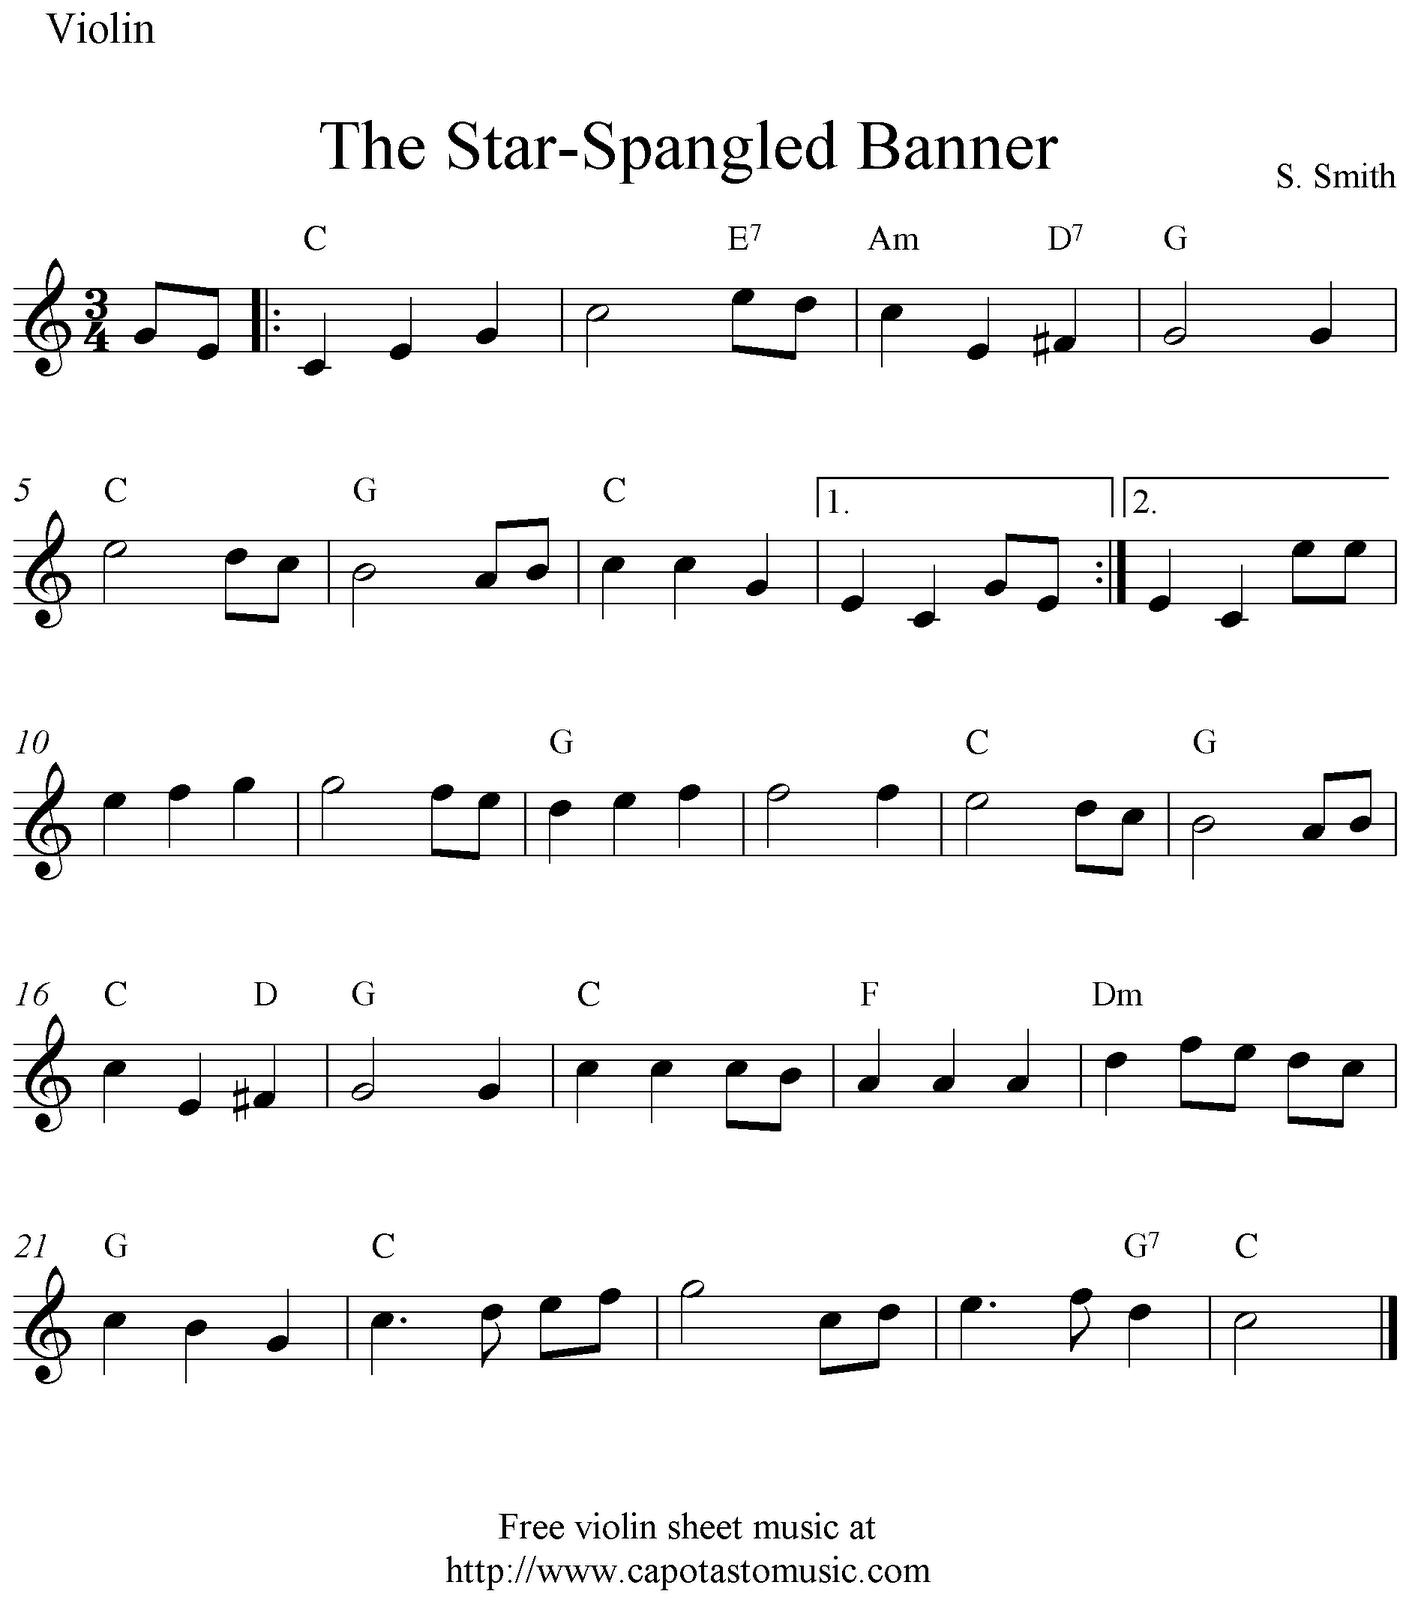 The Star-Spangled Banner, Free Easy Violin Sheet Music Notes - Free Printable Piano Sheet Music For The Star Spangled Banner